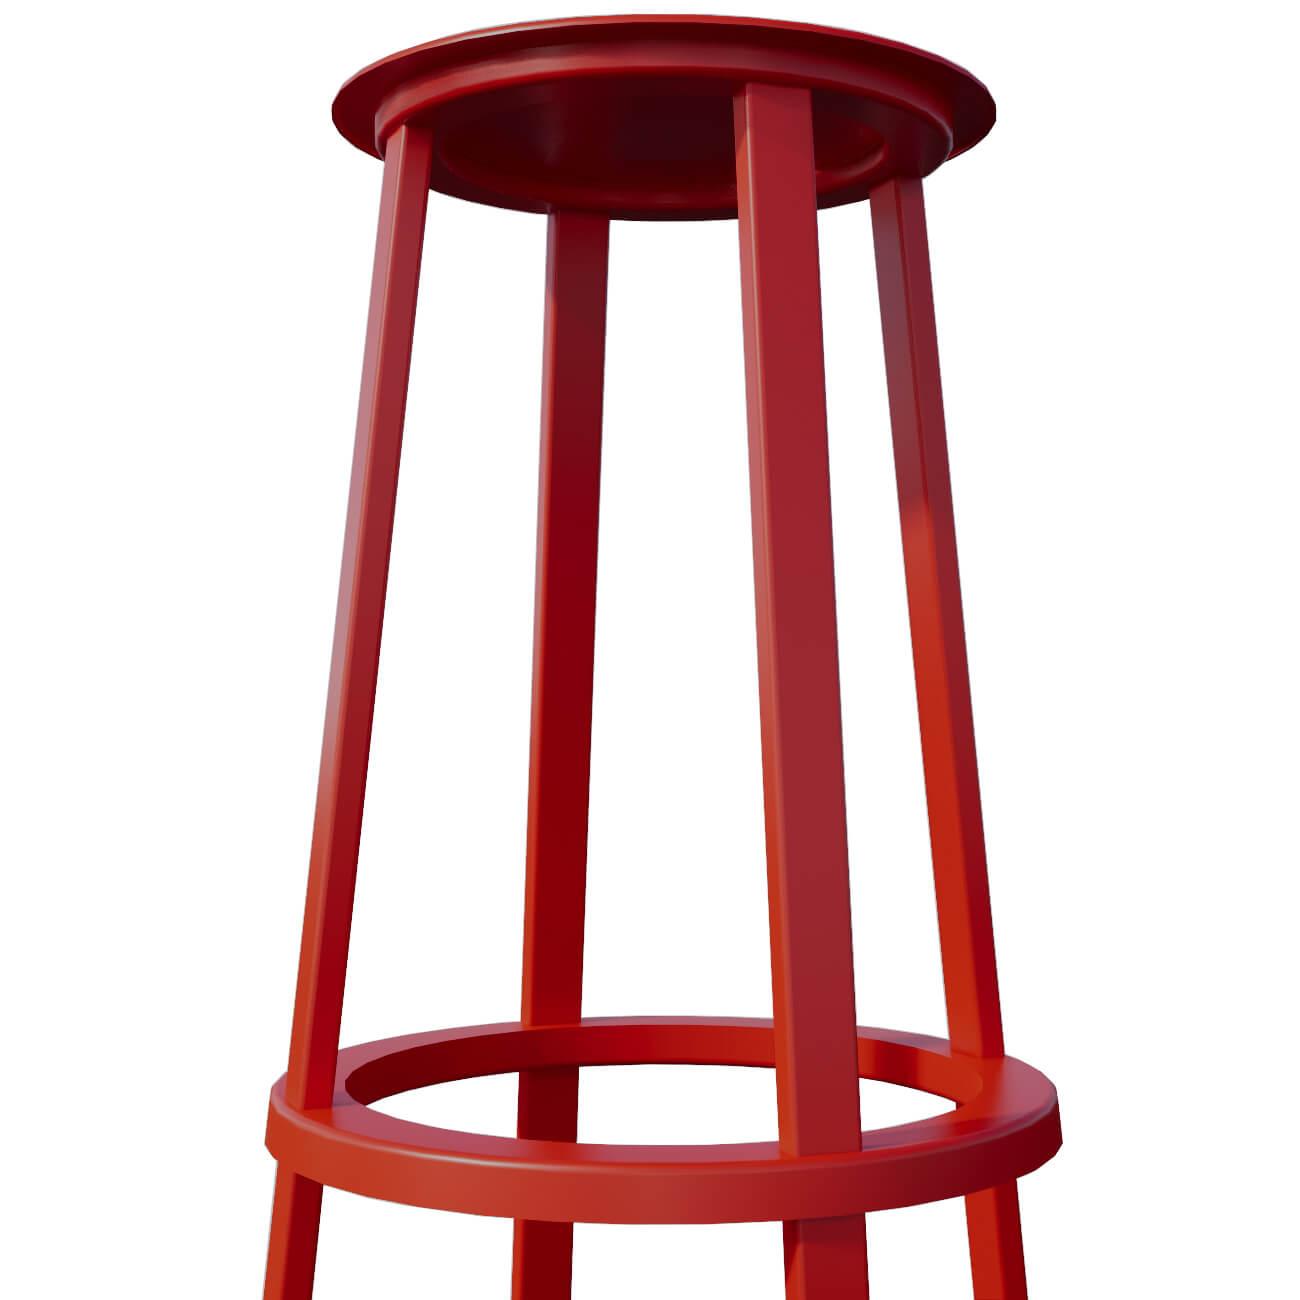 RED STOOL - SEAT